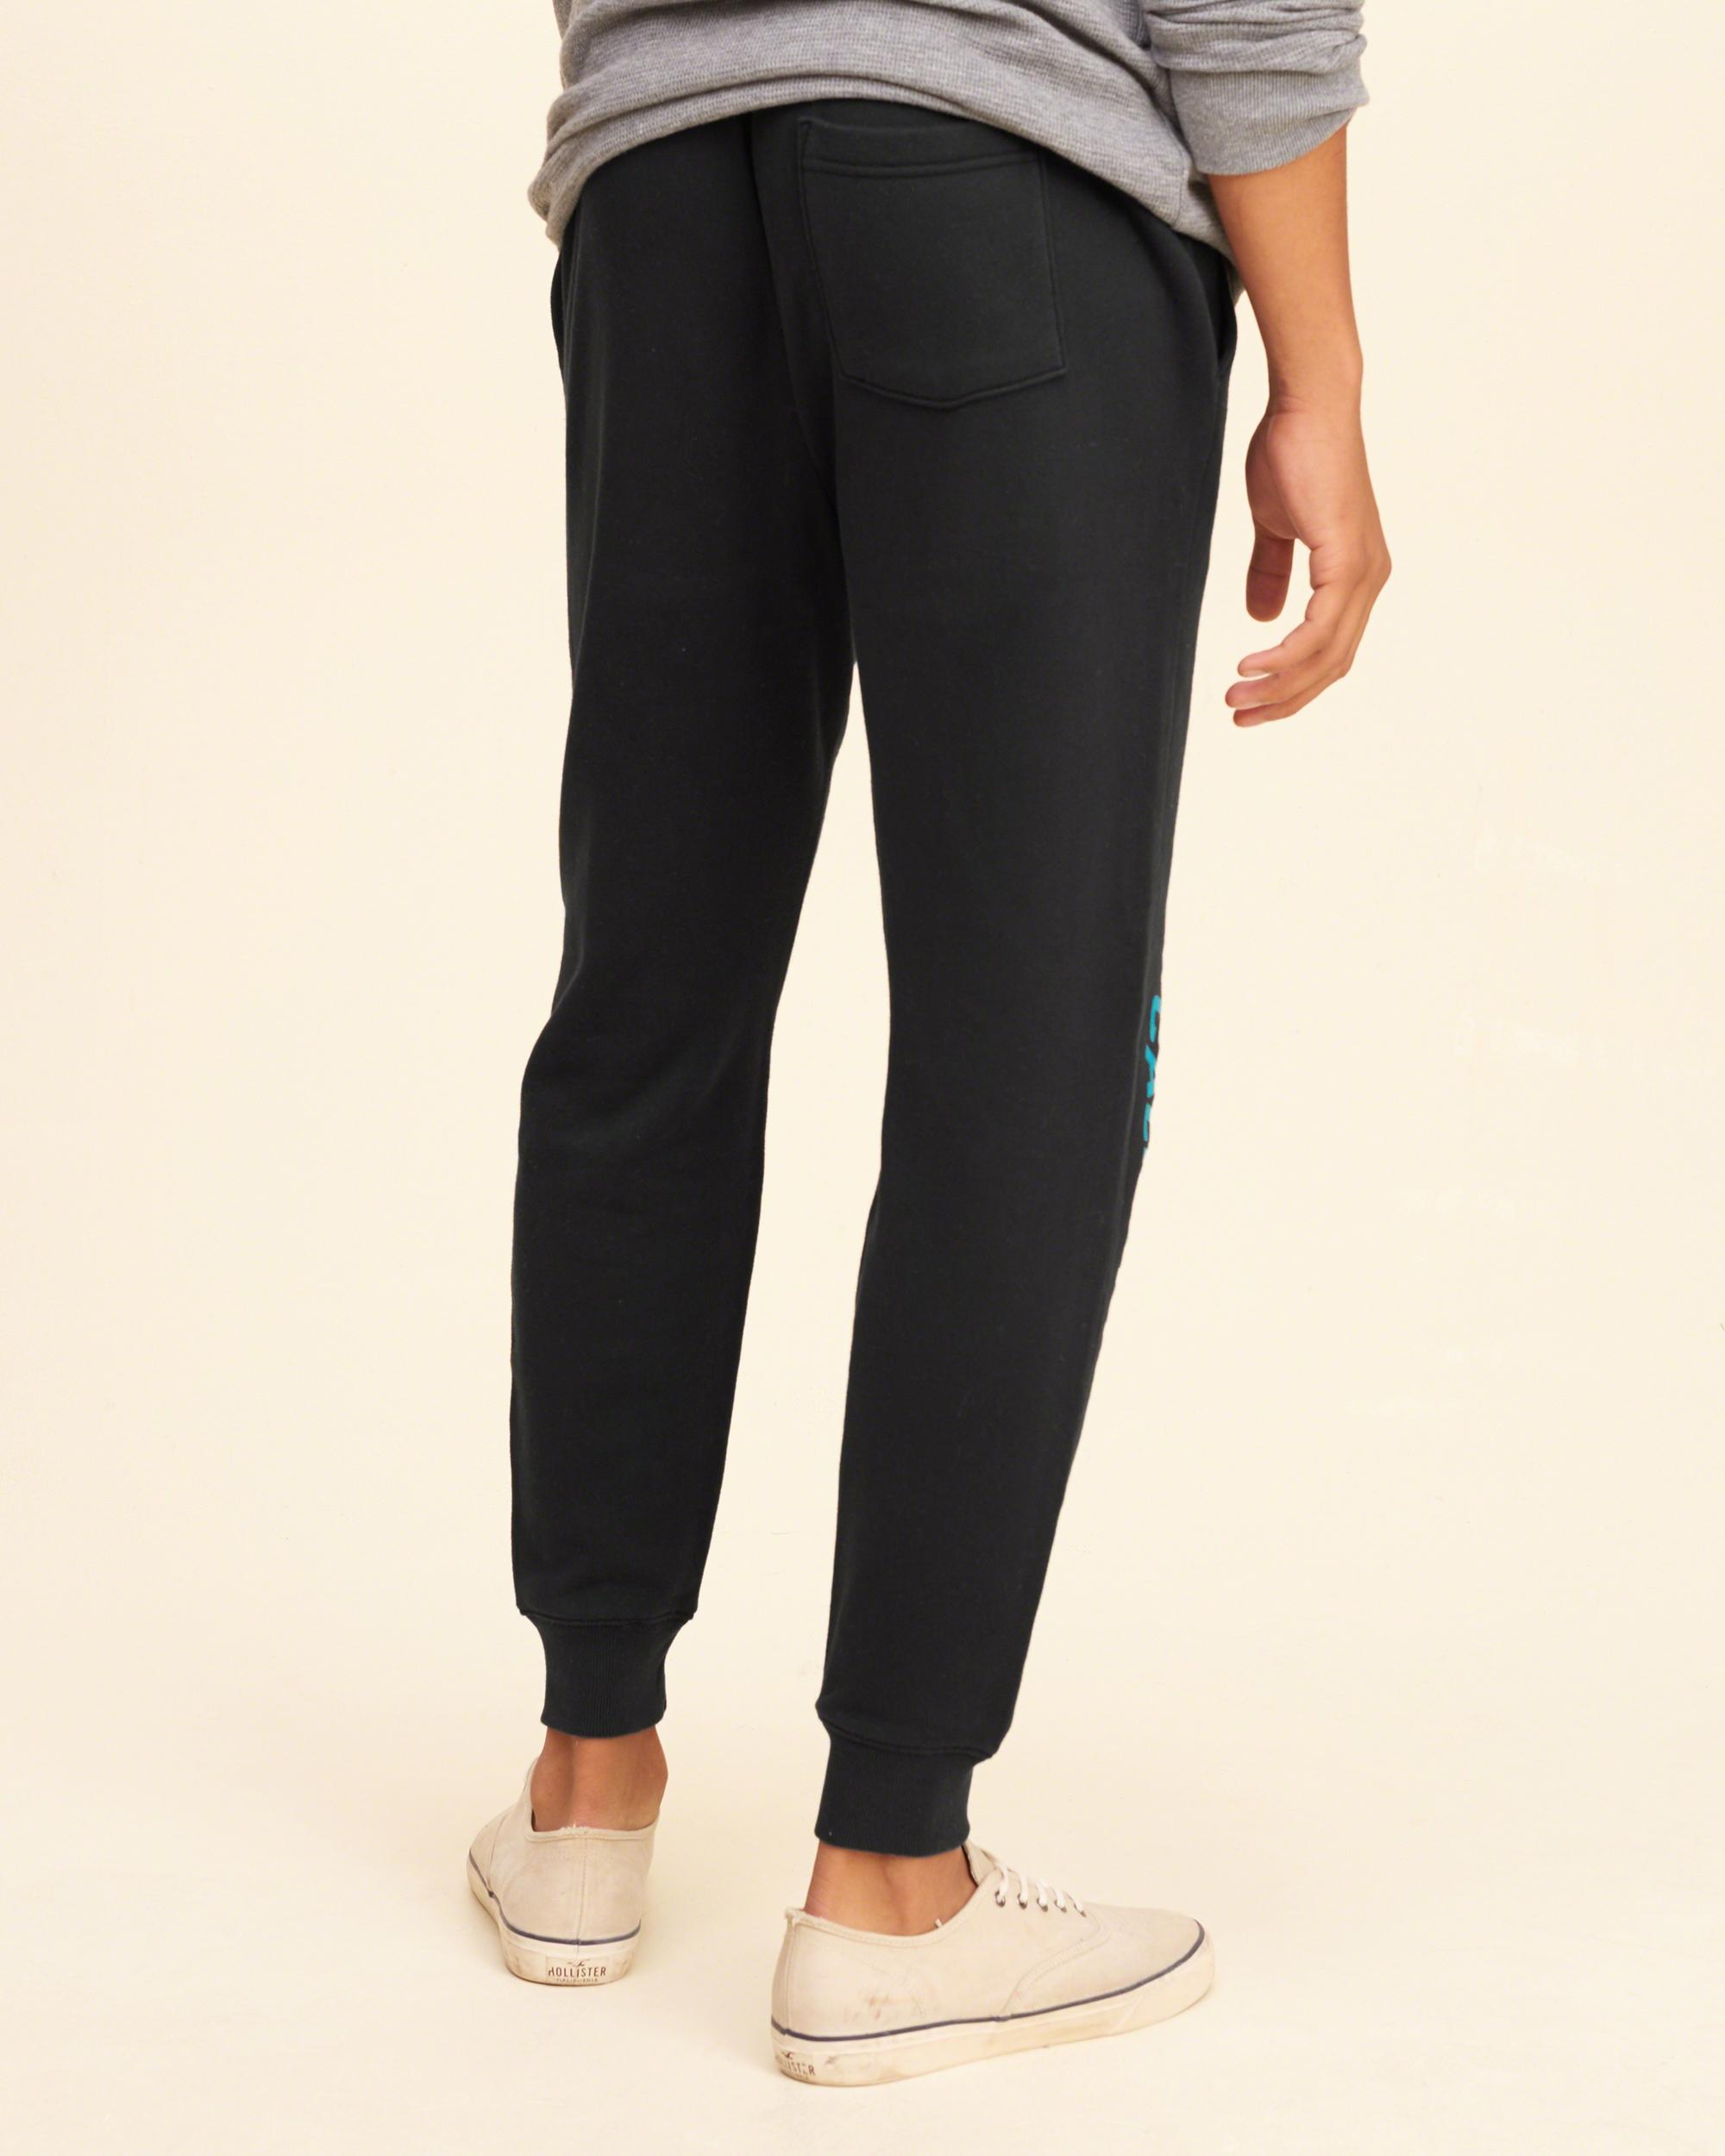 hollister jeans for men logo - photo #5